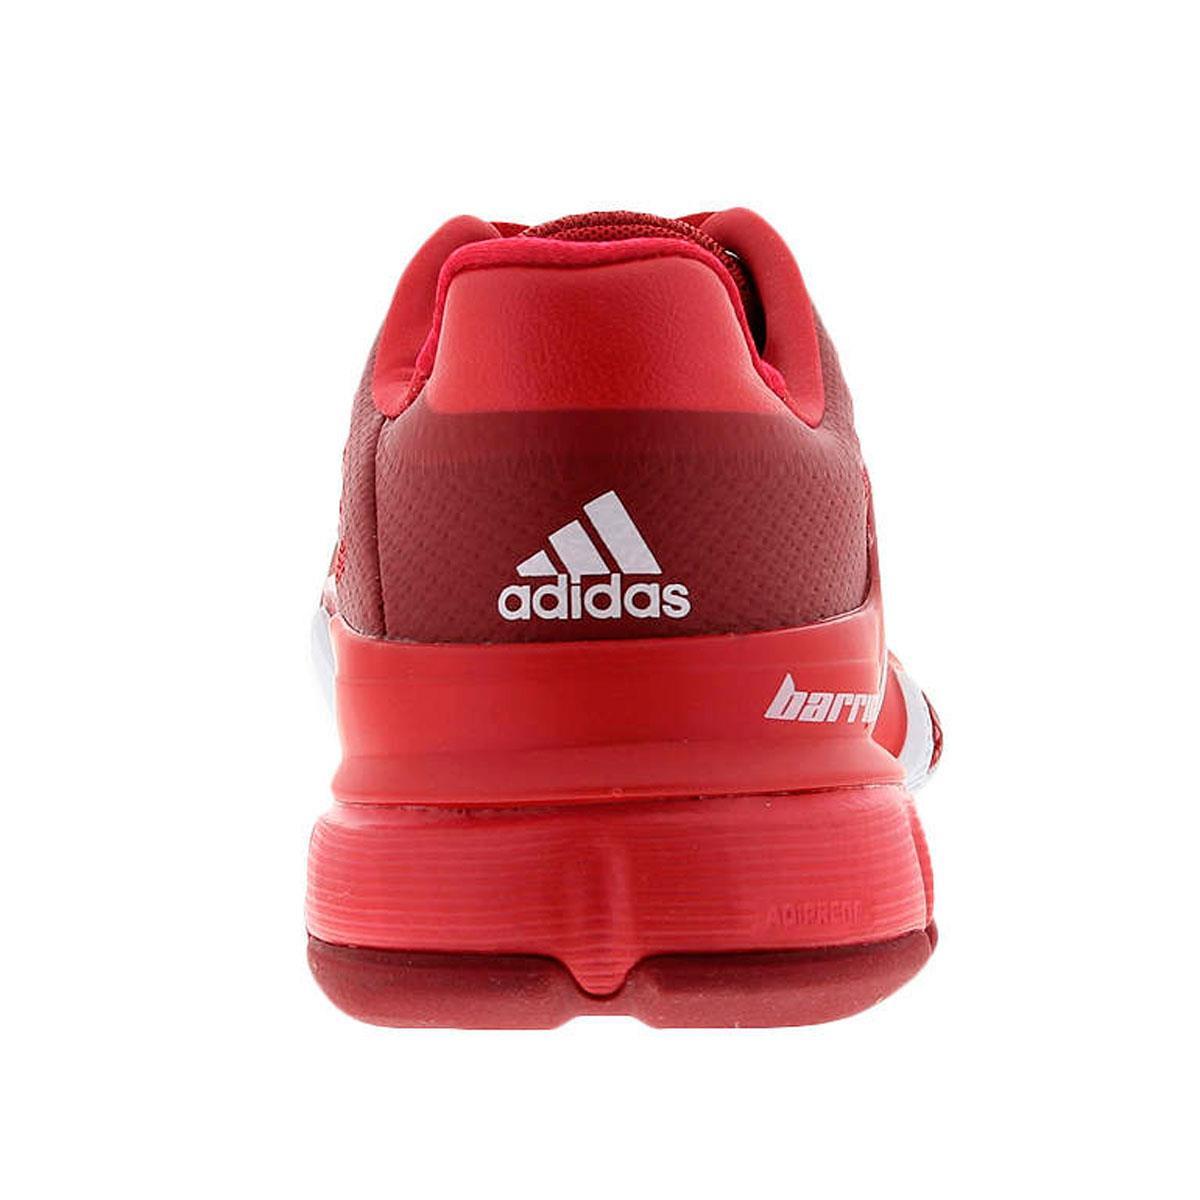 c3a1b3c4953 Tênis Adidas Barricade 2016 Masculino